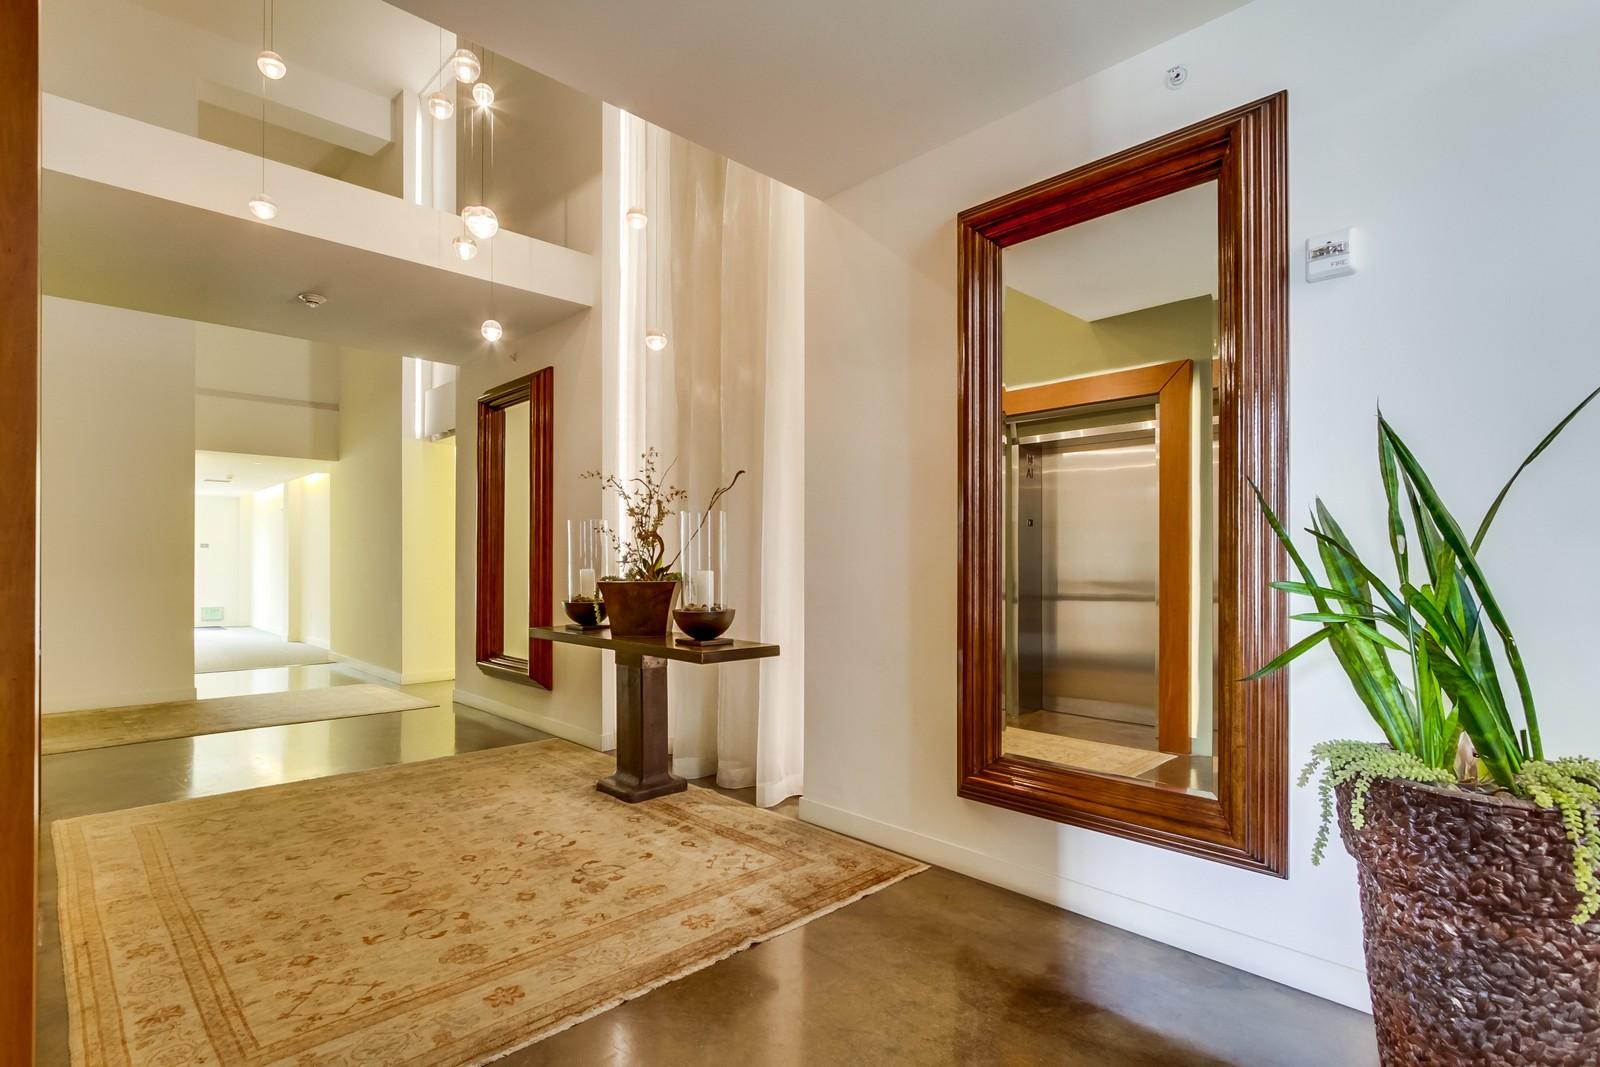 Additional photo for property listing at 845 Fort Stockton Drive, 311  San Diego, California 92103 Estados Unidos